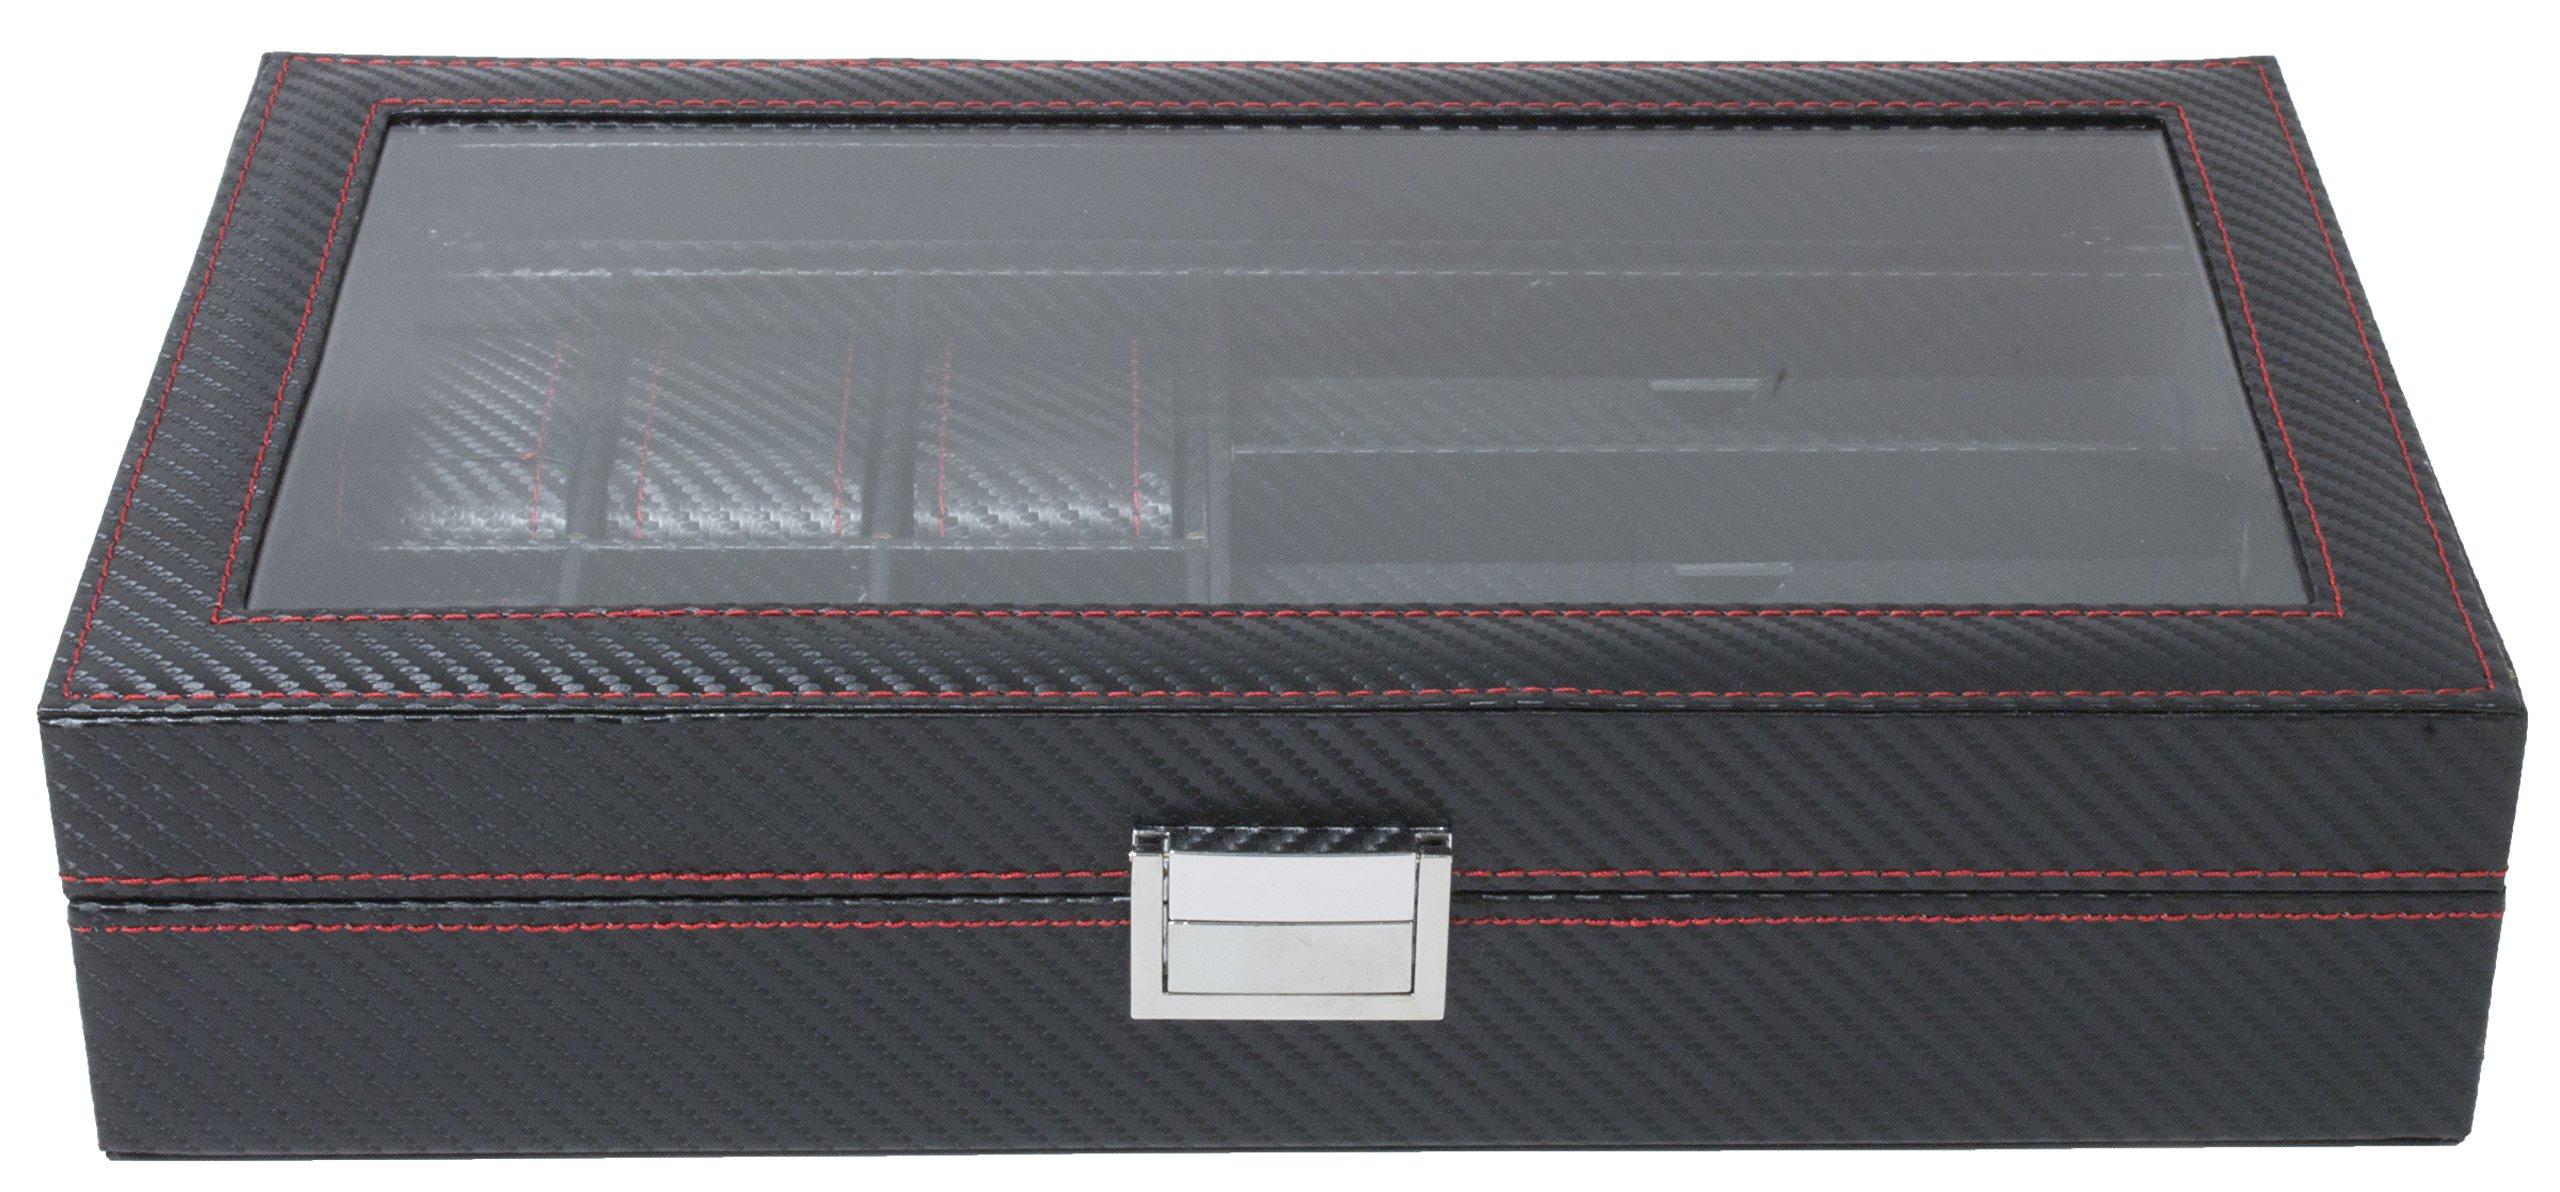 Royal Brands 6 Piece Watch Box with 3 Piece Eyeglass Organizer Tray Carbon Fiber Pattern Display Jewelry Storage Case